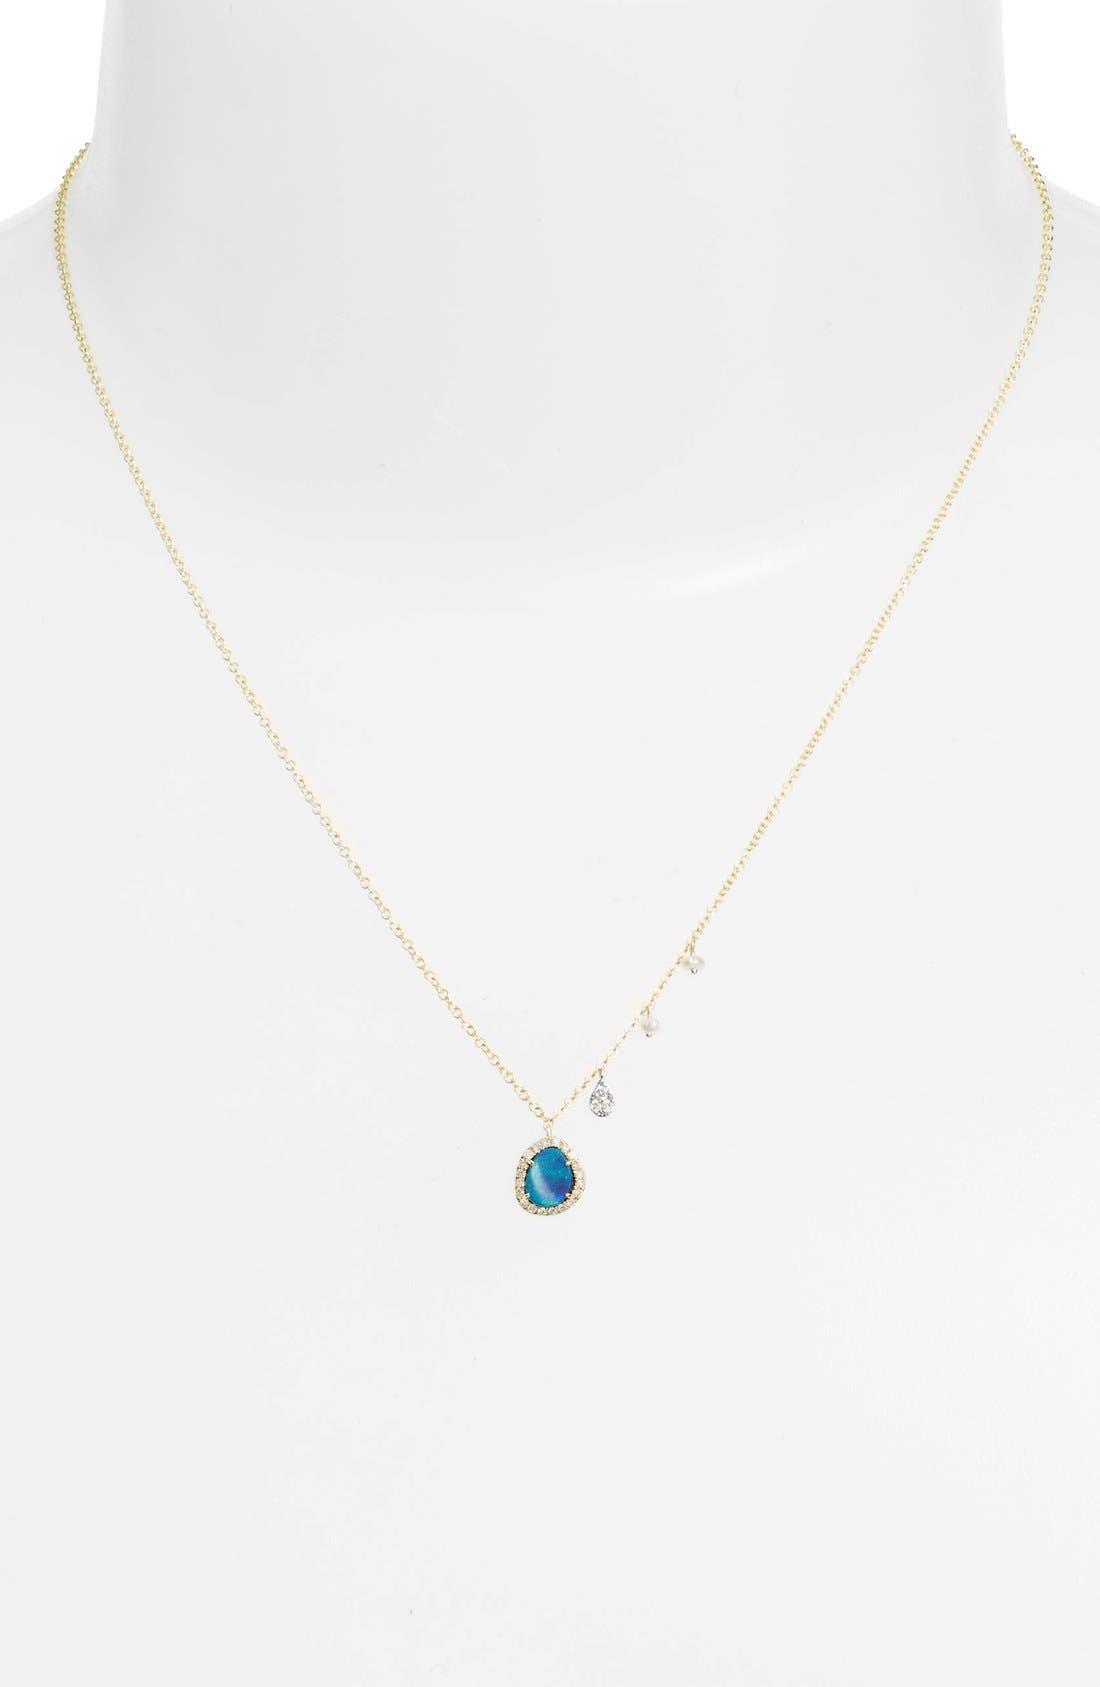 Mini Stone Diamond Pendant Necklace,                             Alternate thumbnail 3, color,                             YELLOW GOLD/ OPAL